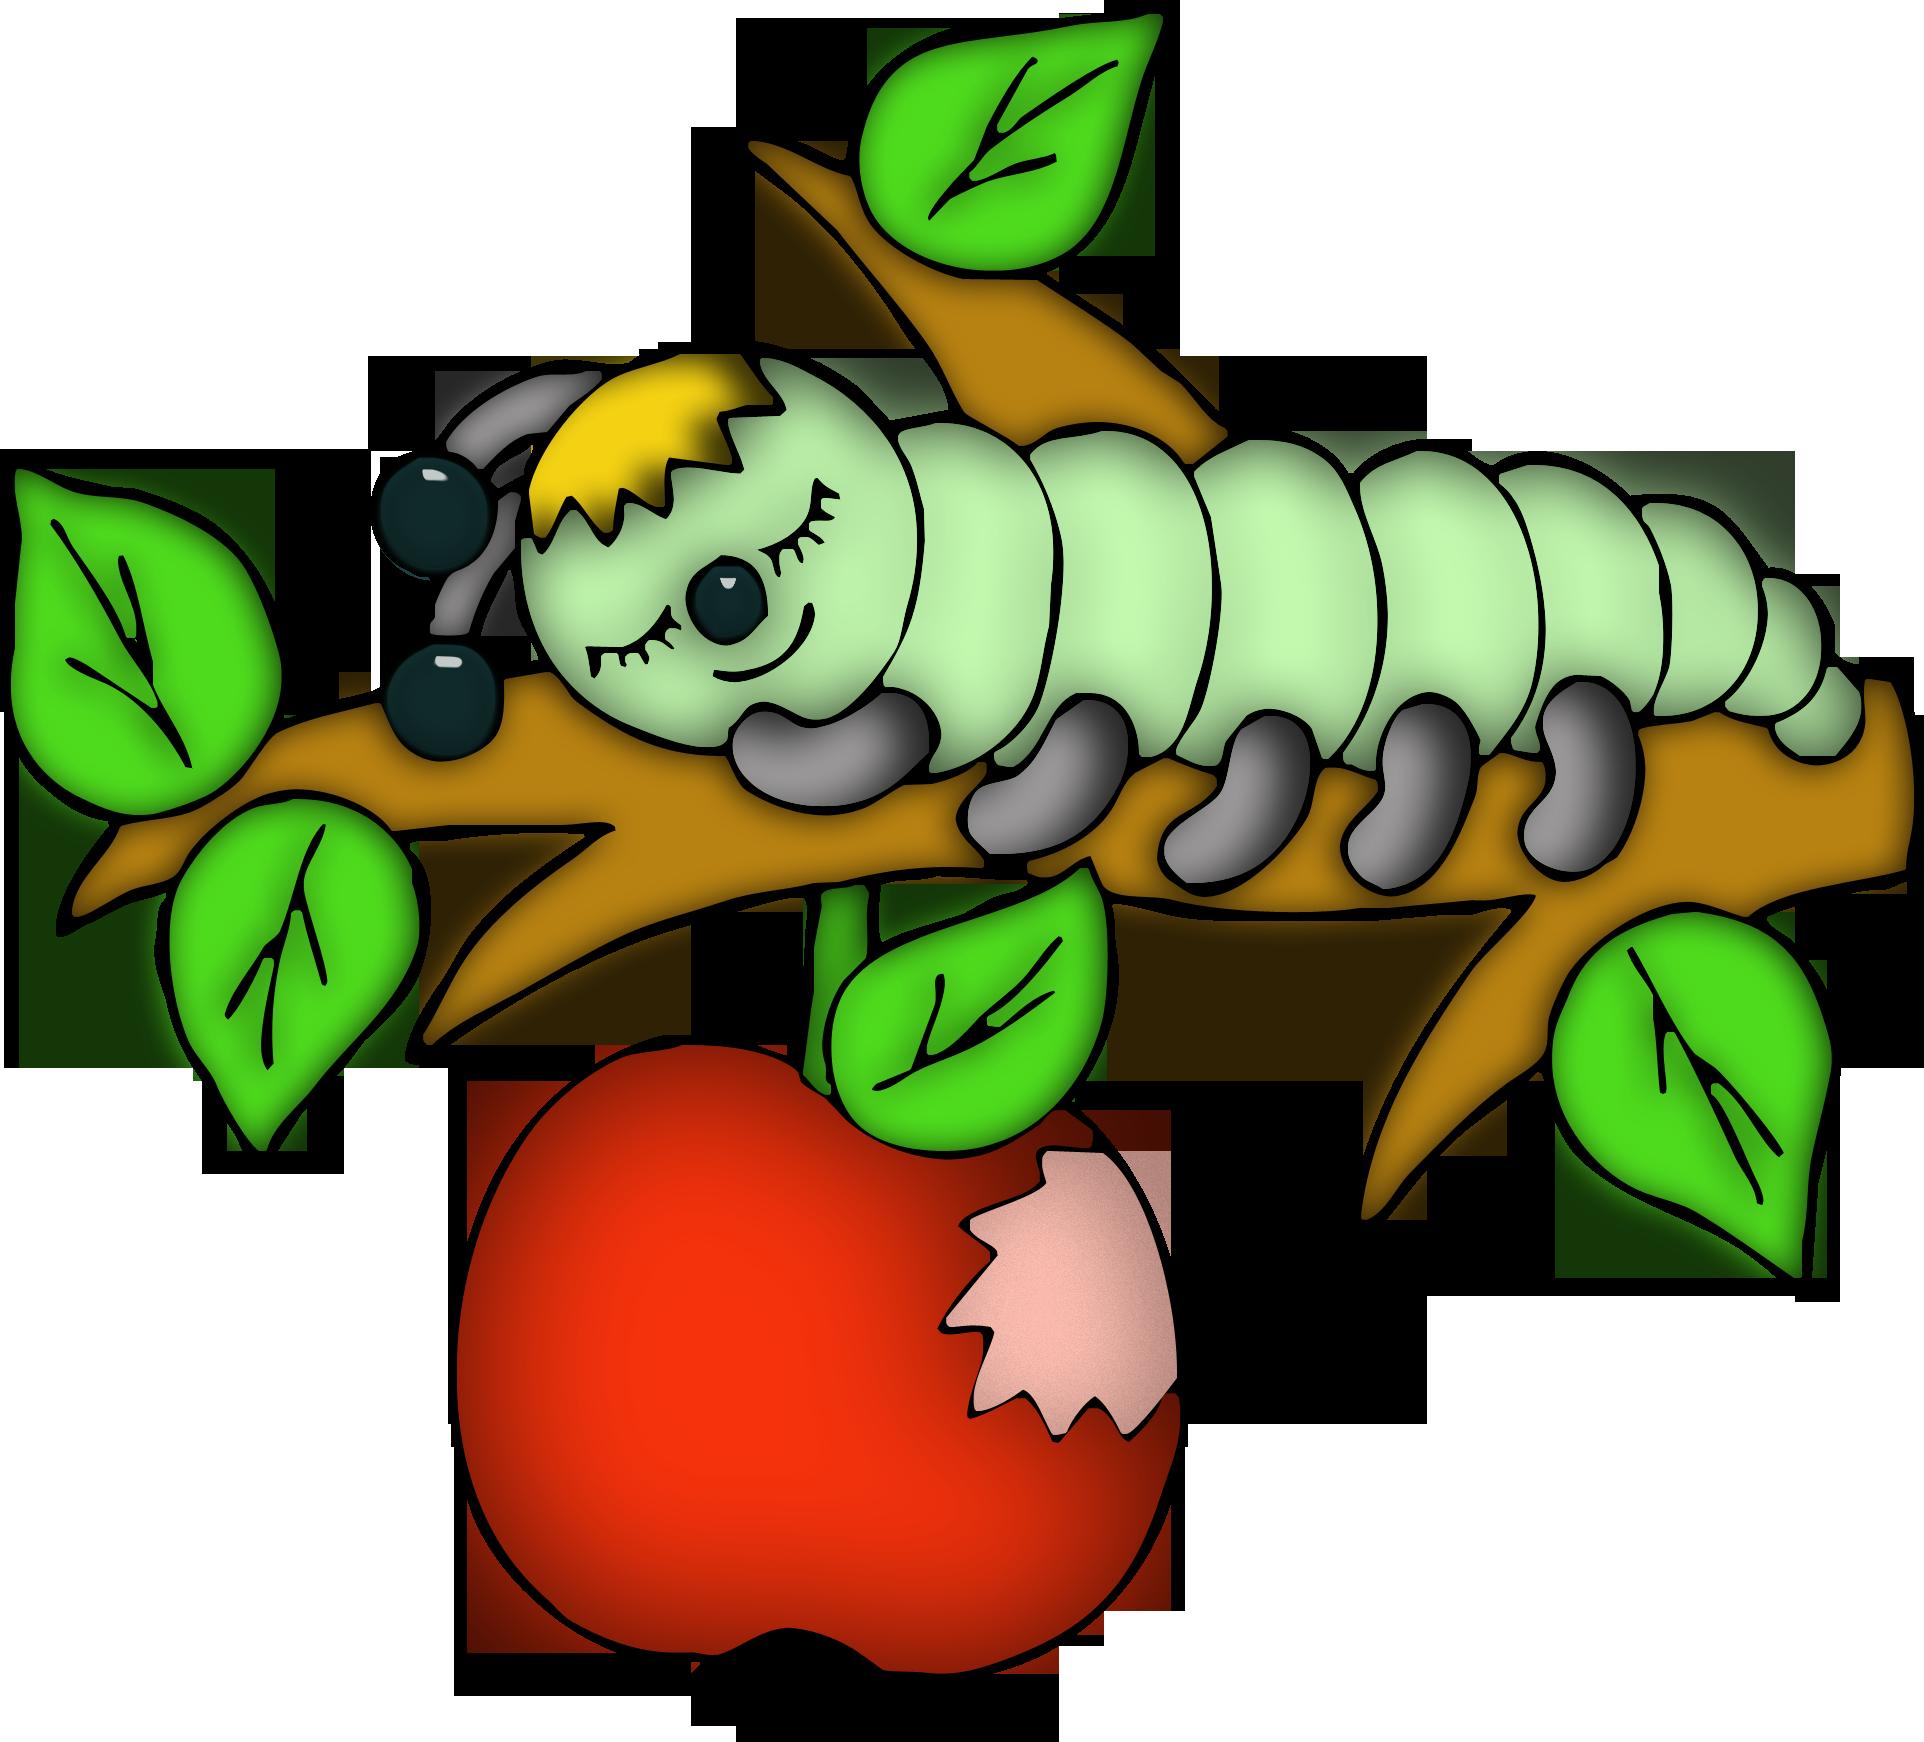 Картинки гусеница для детского сада, анимации красота картинки